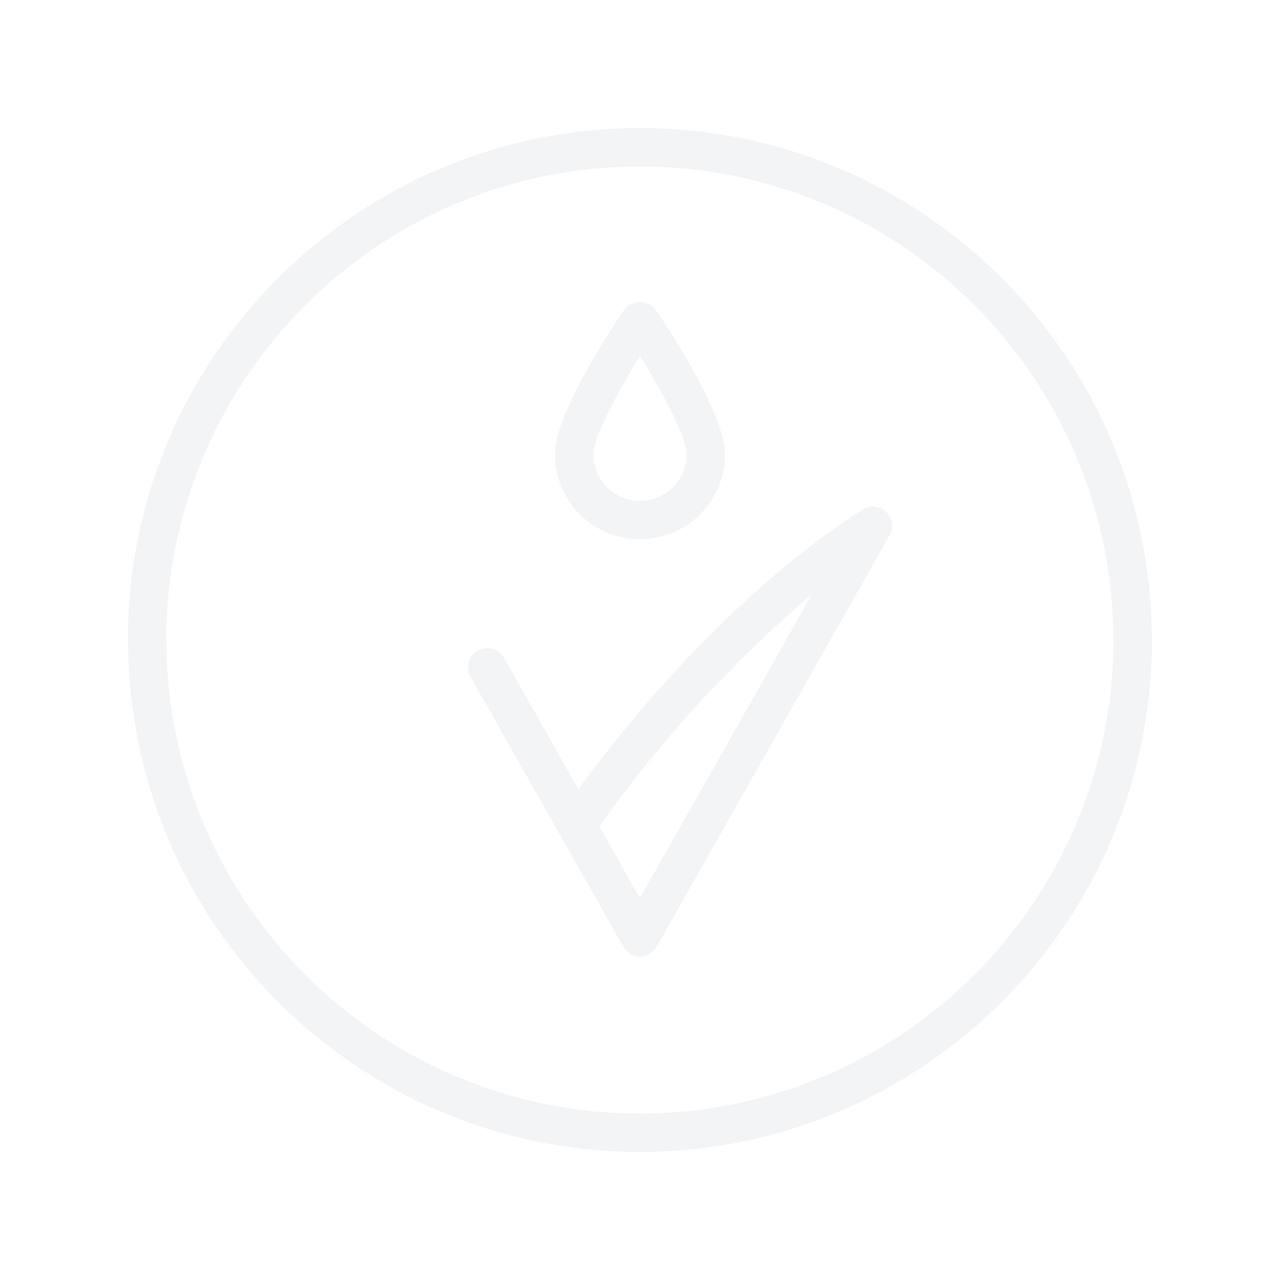 NATURA SIBERICA Vitamins For Skin Shower Gel 50ml